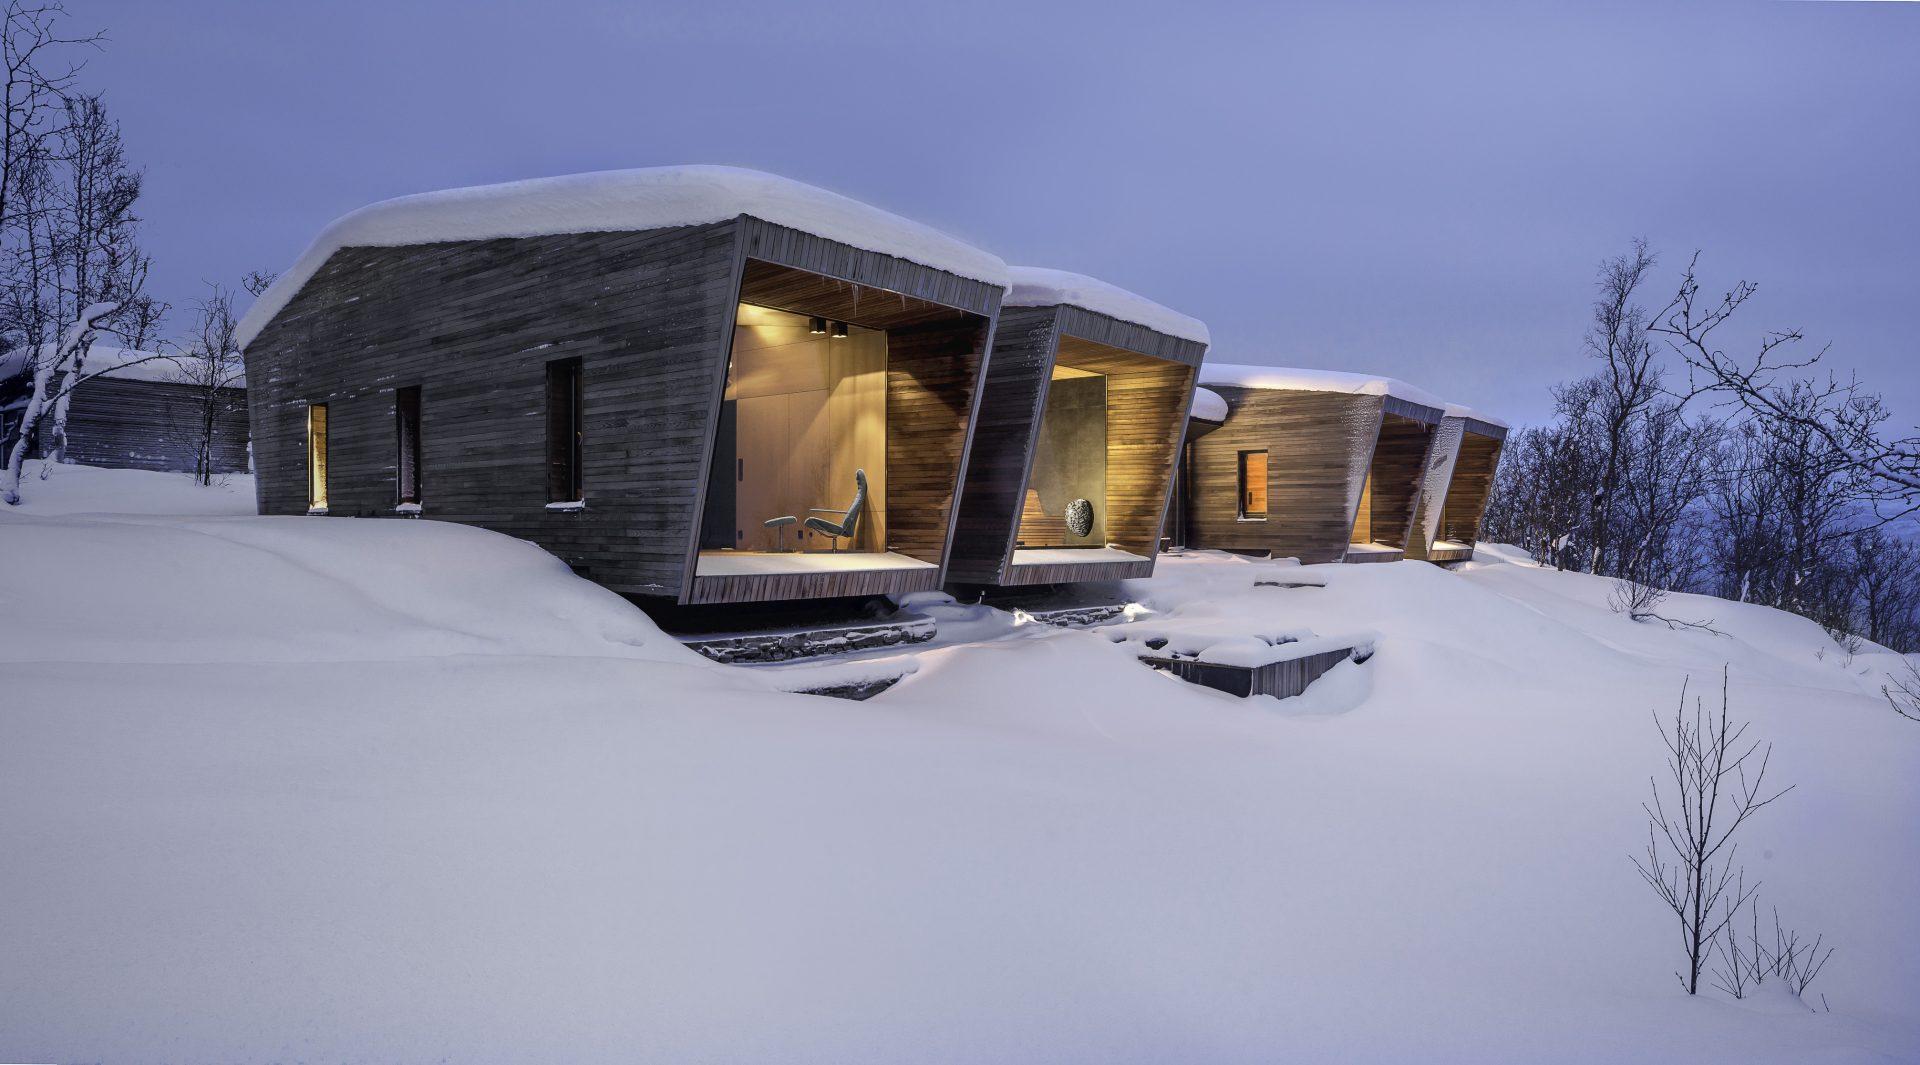 Snorre Stinessen Architecture